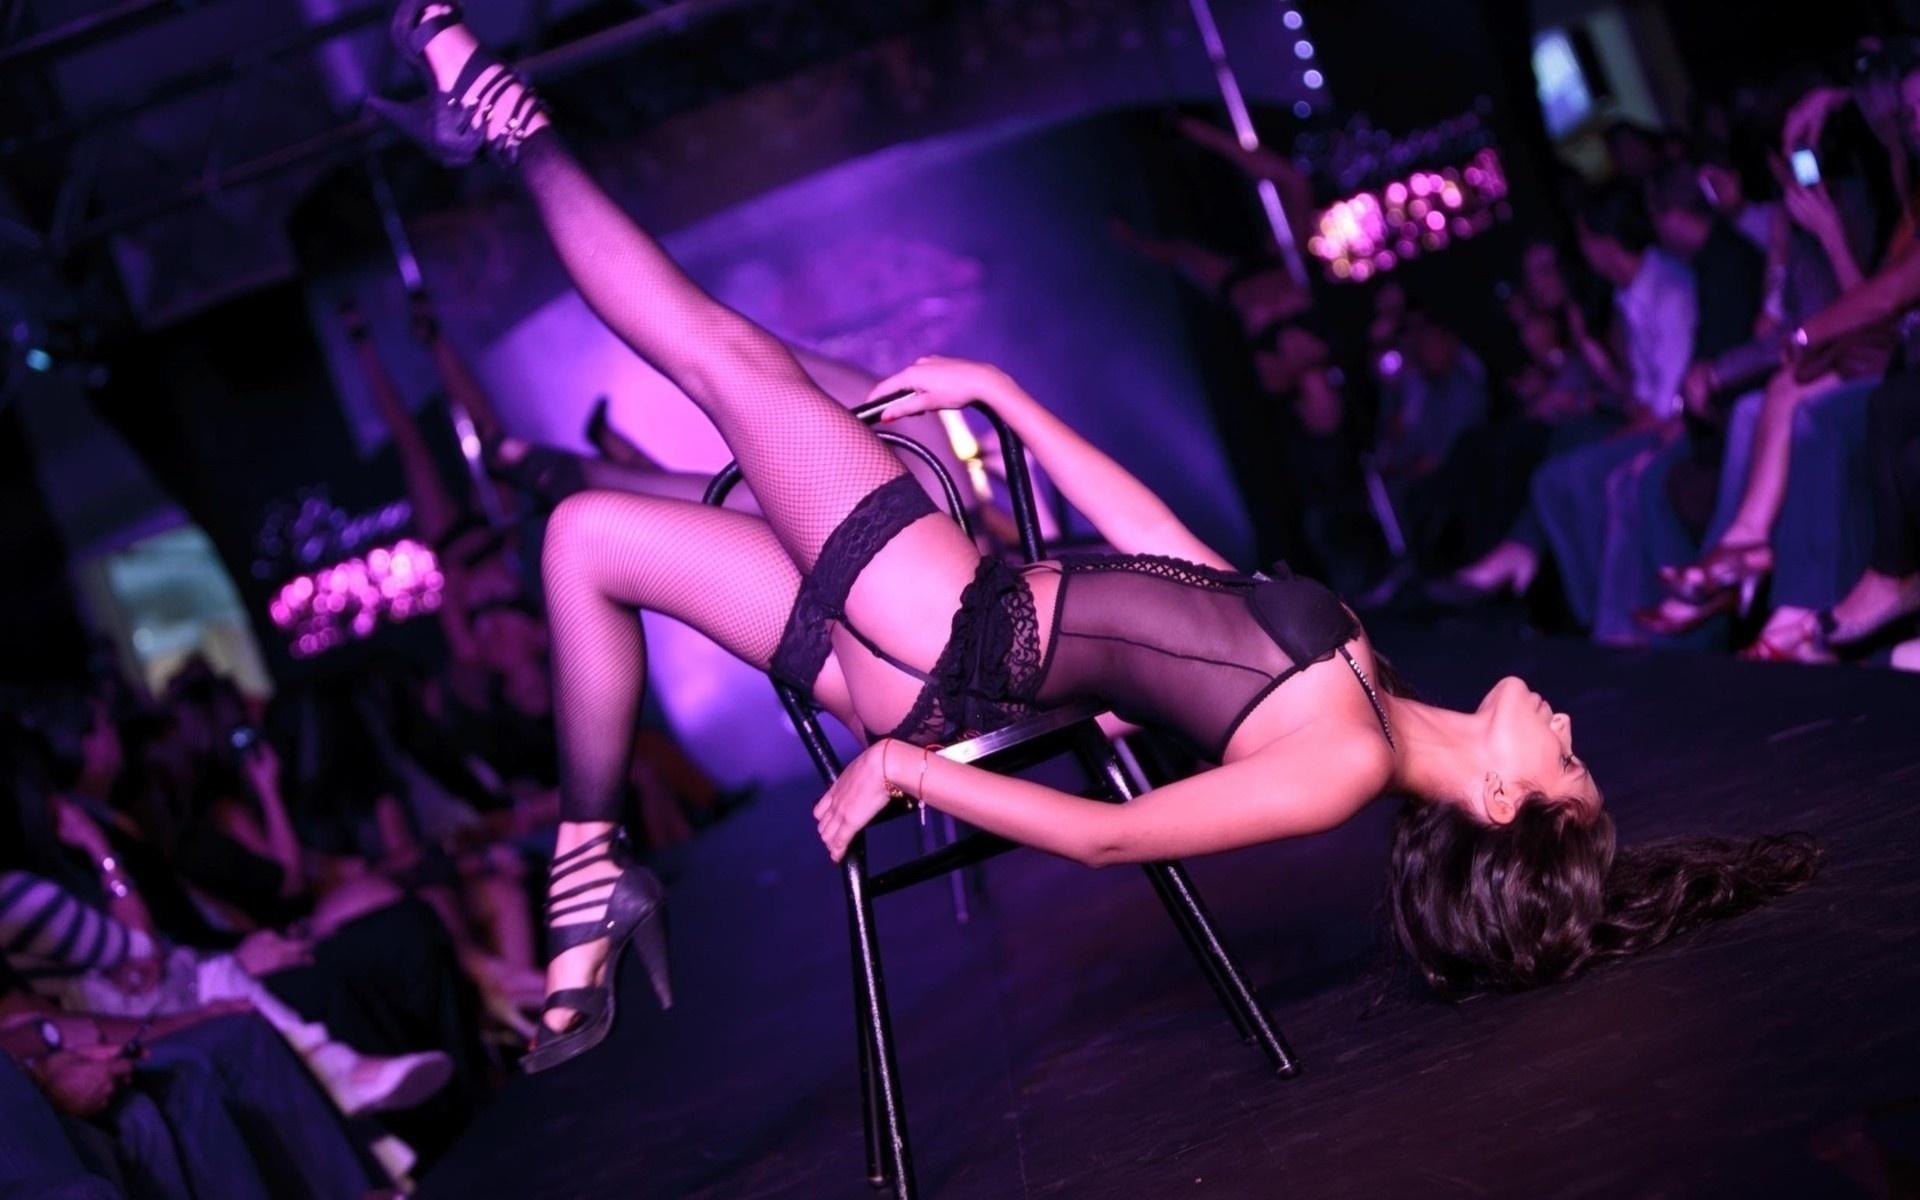 Striptease female videos